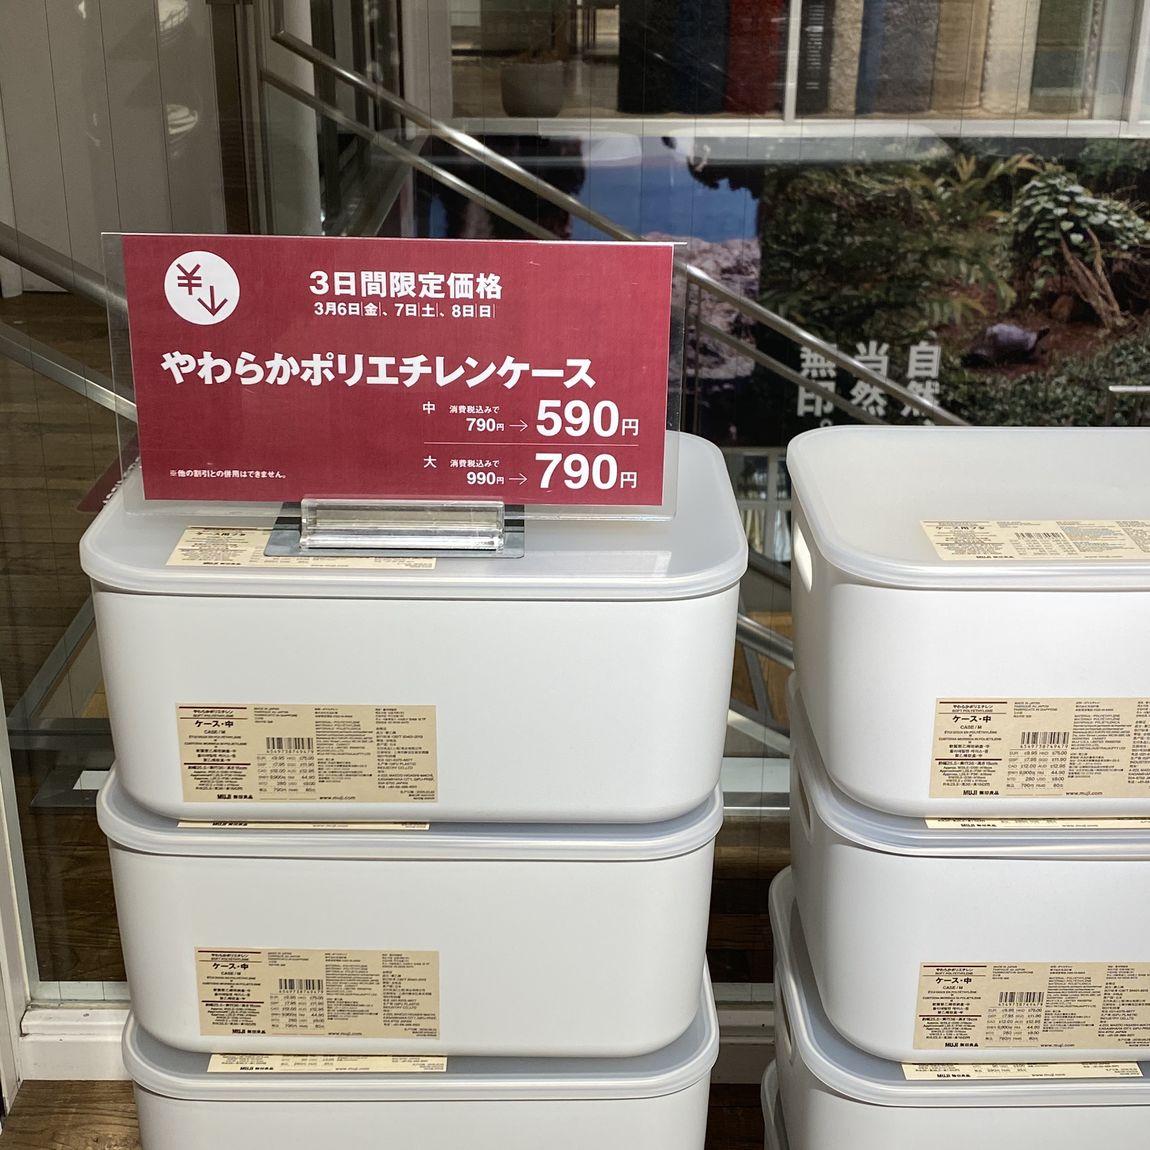 【MUJIキャナルシティ博多】週末限定価格・やわらかポリエチレンケース